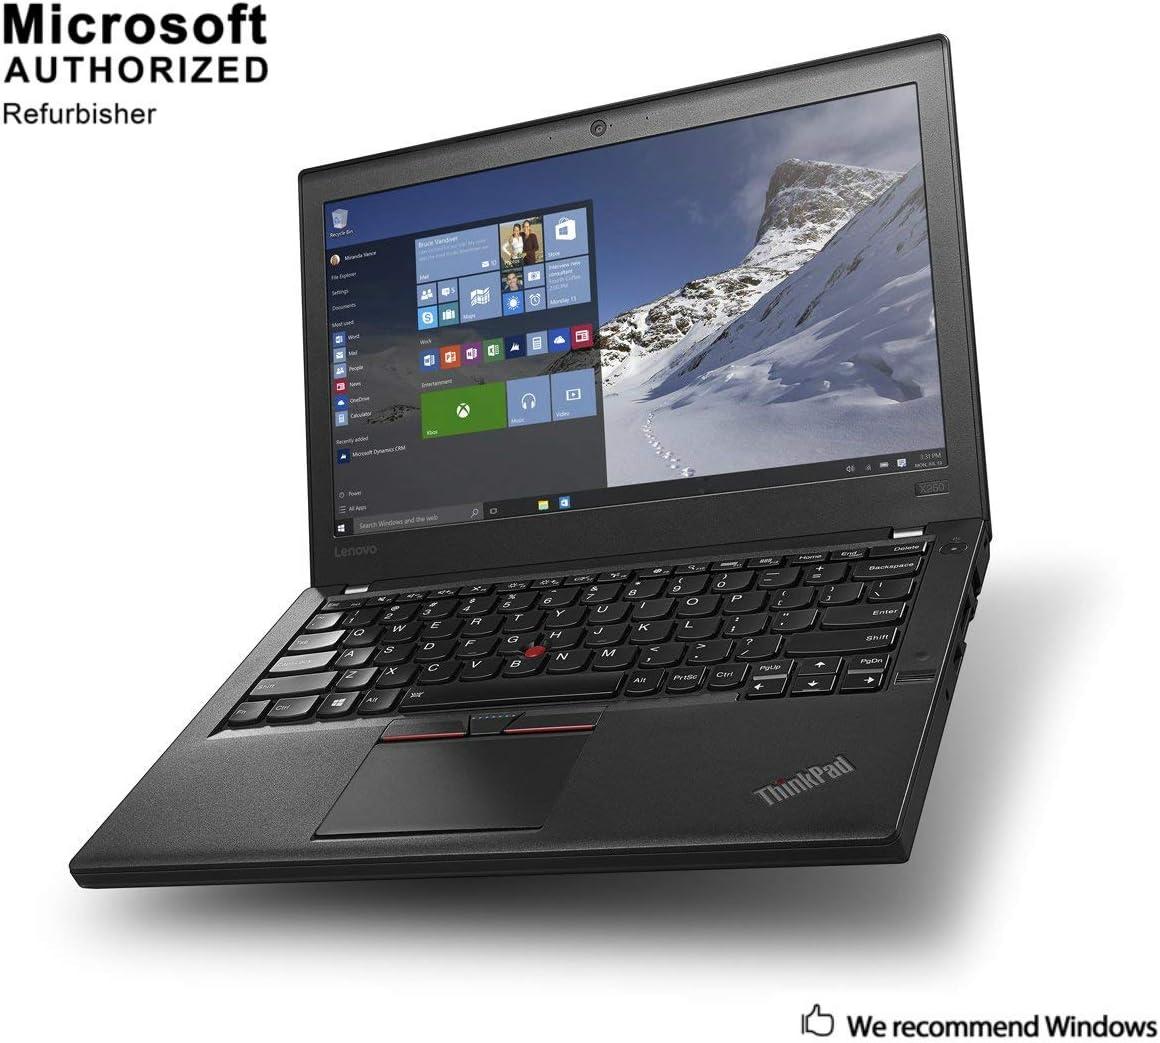 Lenovo ThinkPad X260 6th Gen 12.5 Inch Laptop , Intel Core i5 6300U up to 3.0GHz, 8G DDR4, 500G, WiFi, BT 4.0, HDMI, Mini DP, USB 3.0, Win 10 64 Bit-Multi-Language, EN / ES / FR(CI5)(Renewed)